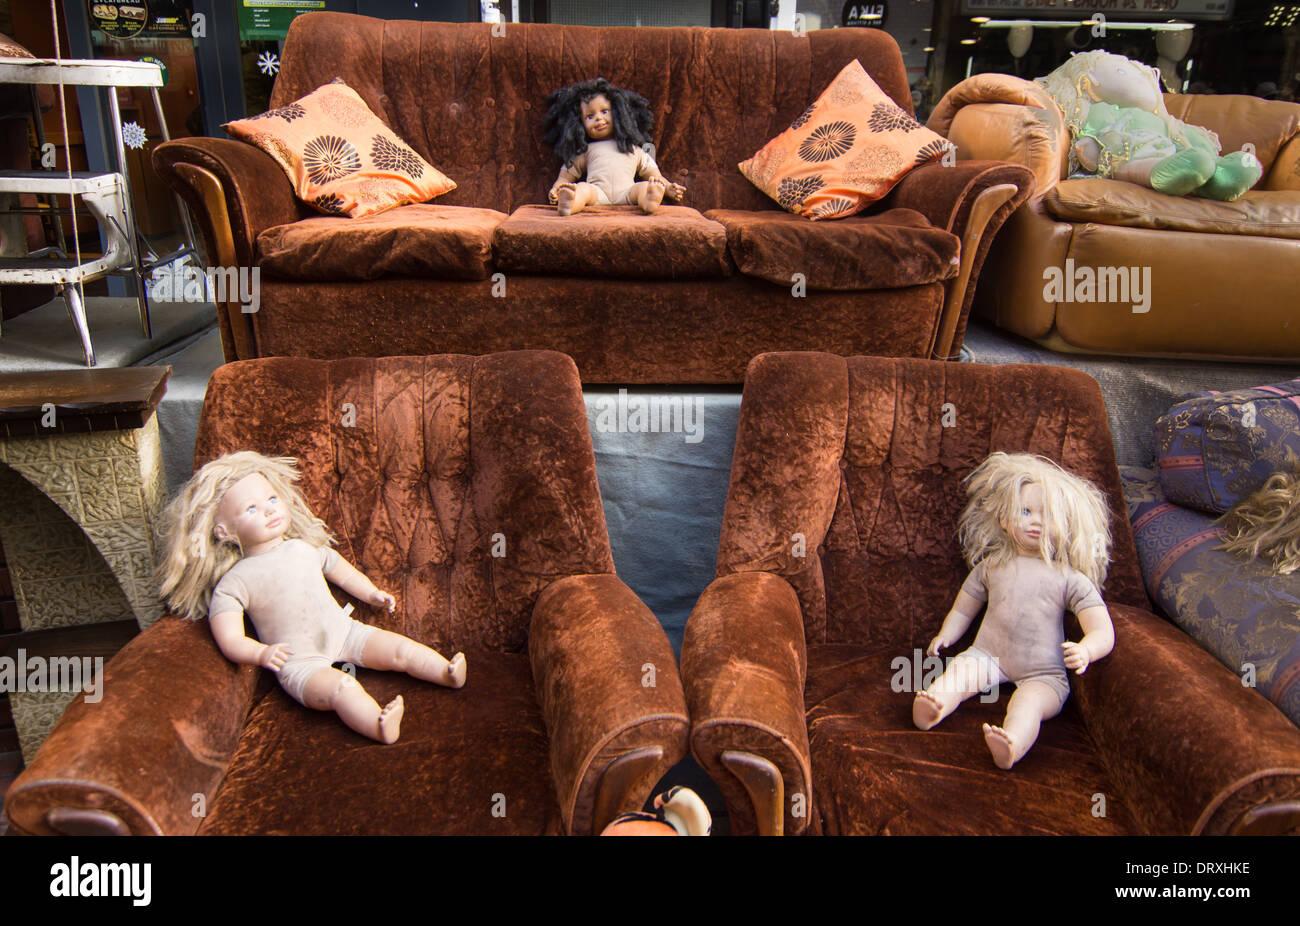 brick lane dolls for sale  strange dolls on sofas - Stock Image